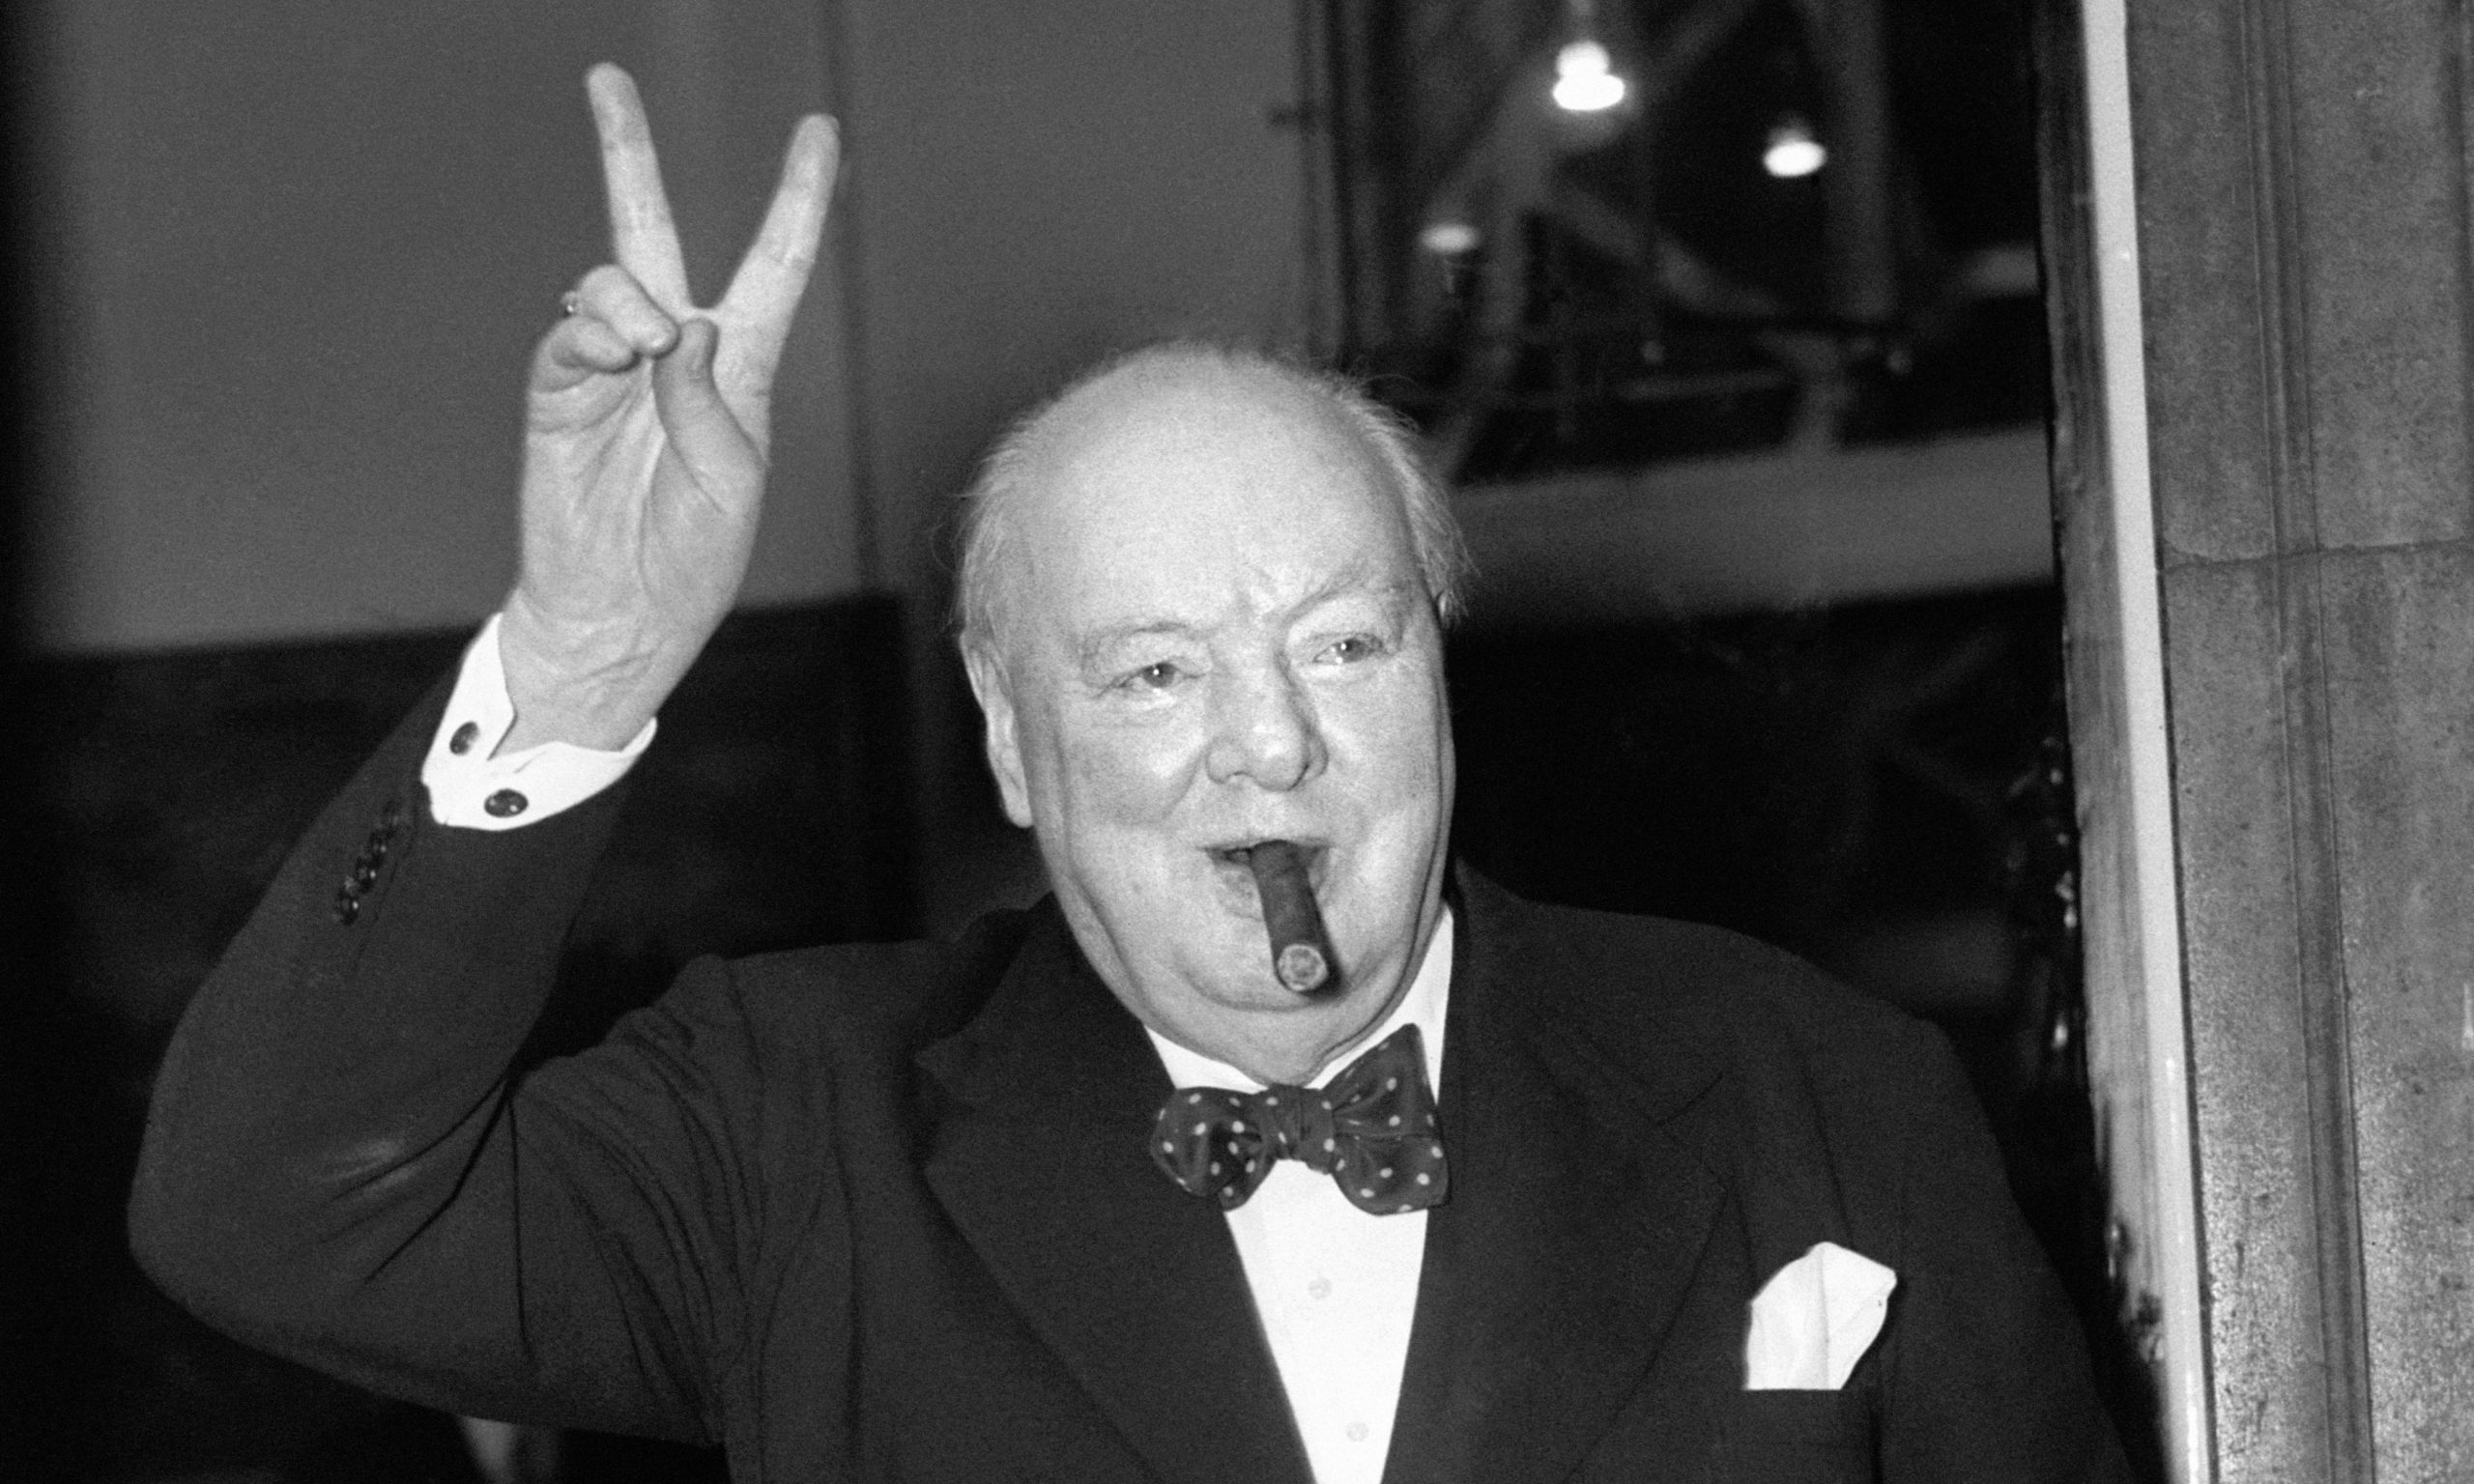 Sir Winston Churchill in September 1954.